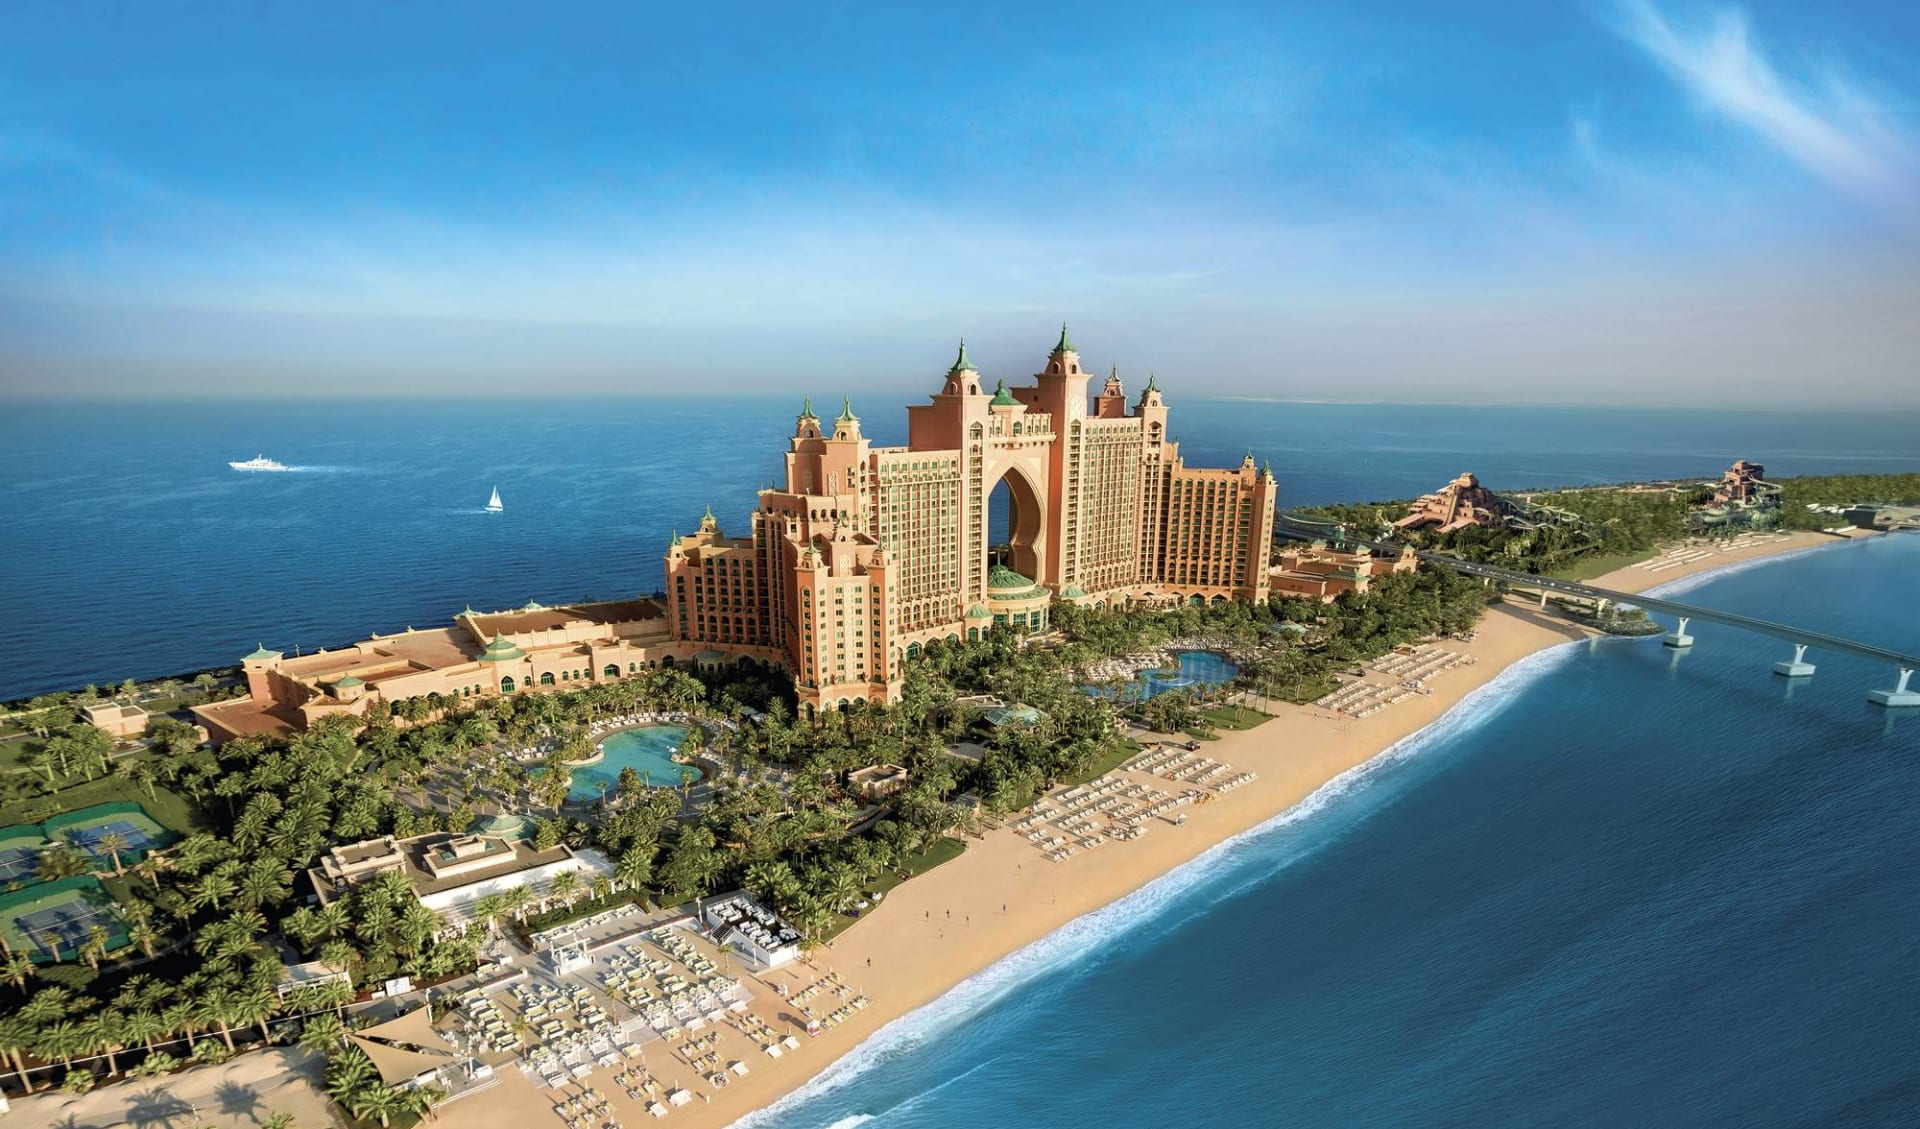 Atlantis The Palm, Dubai: